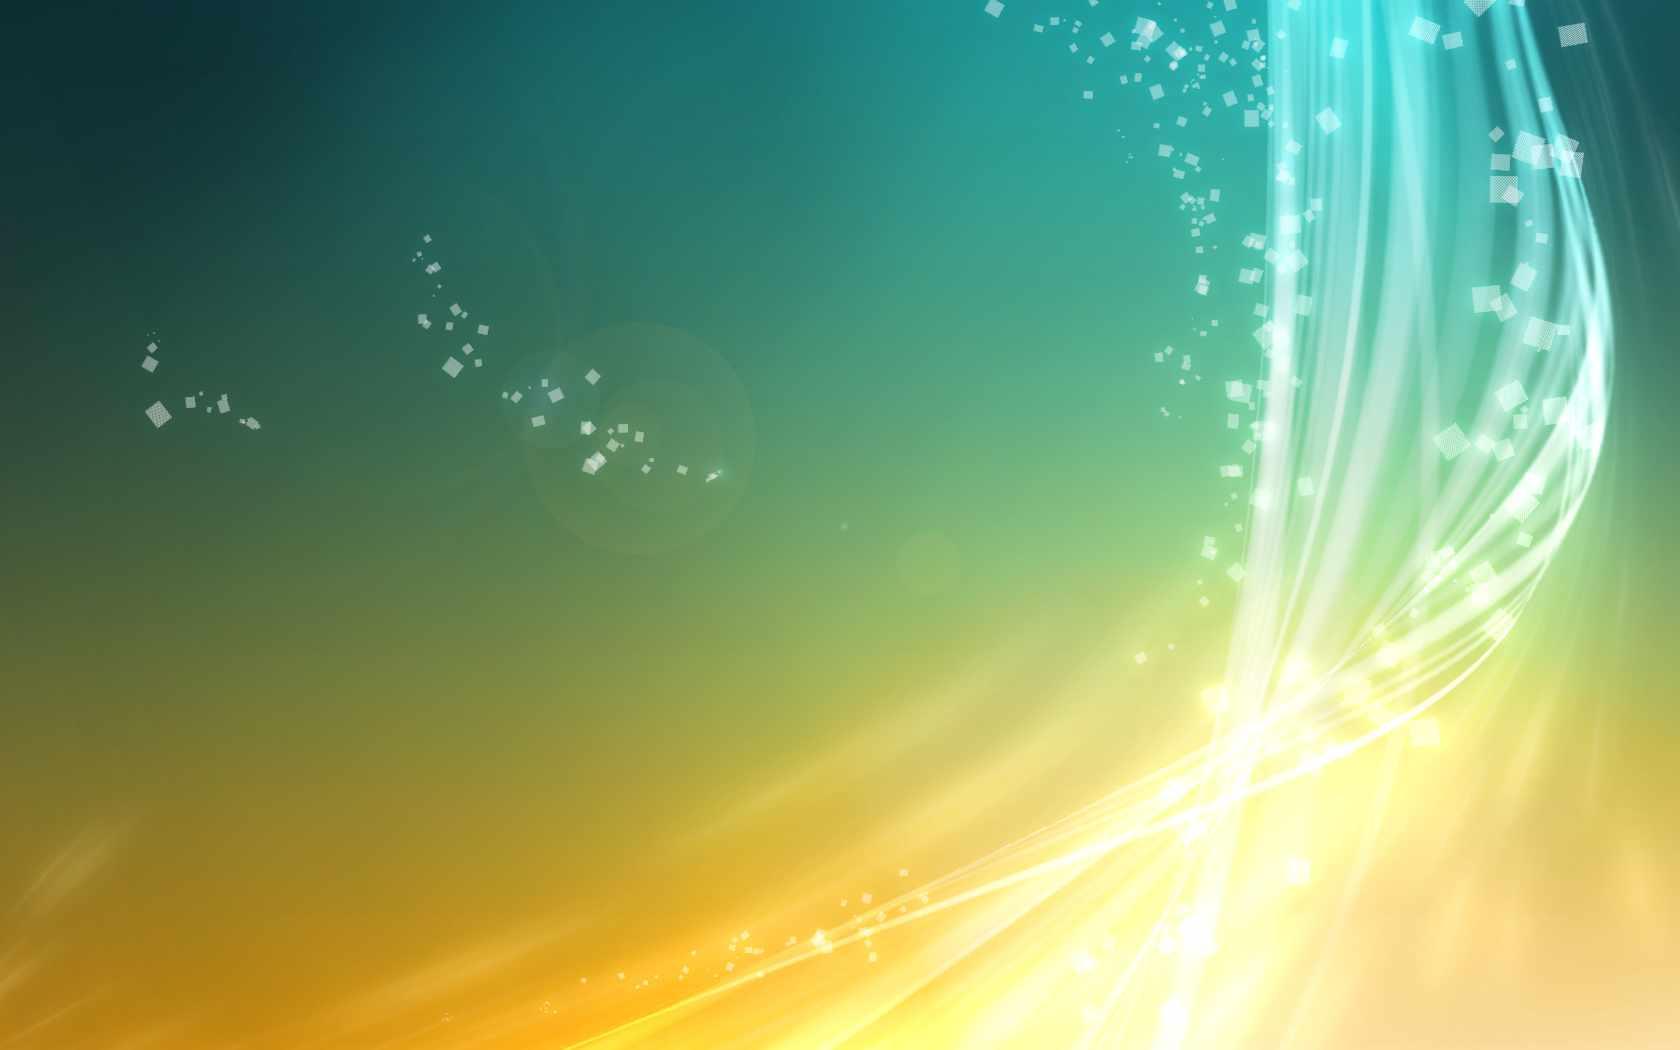 Screen Yellow Light Green Wallpapers For Desktop Backgrounds HD 1680x1050